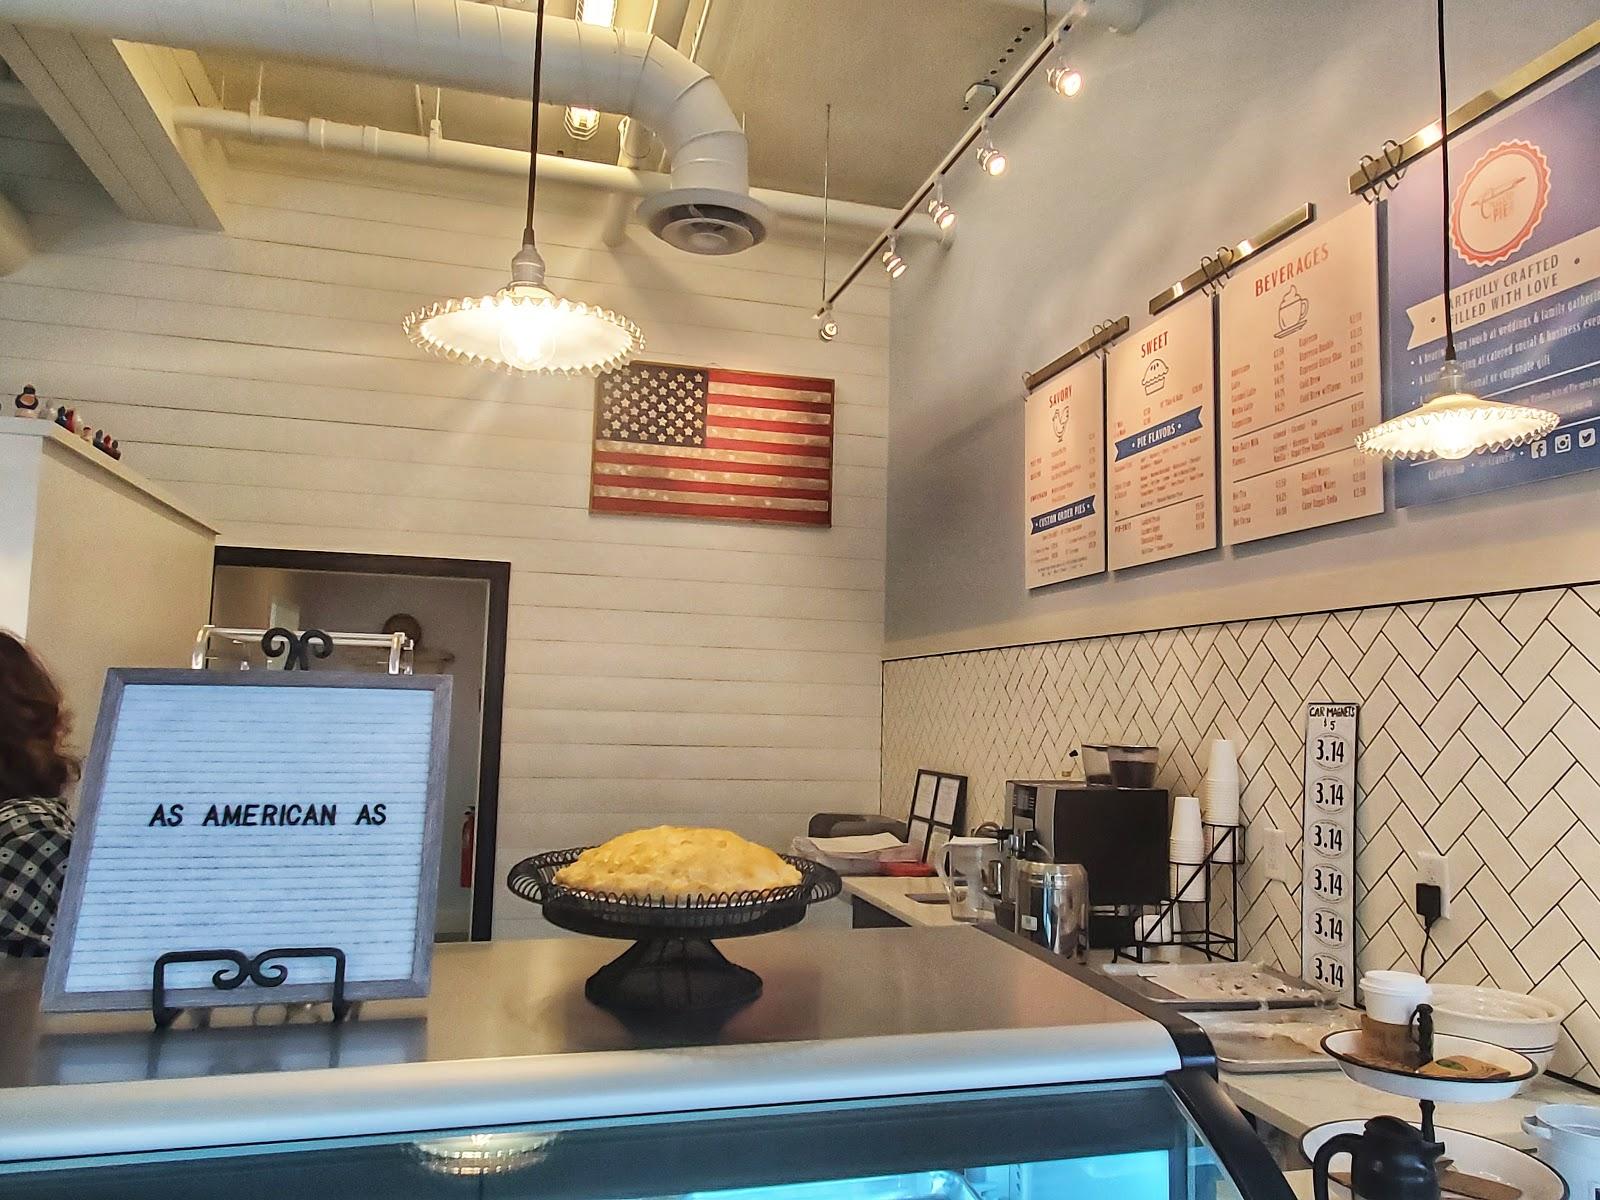 Crave Pie Studio at The Alpharetta City Center